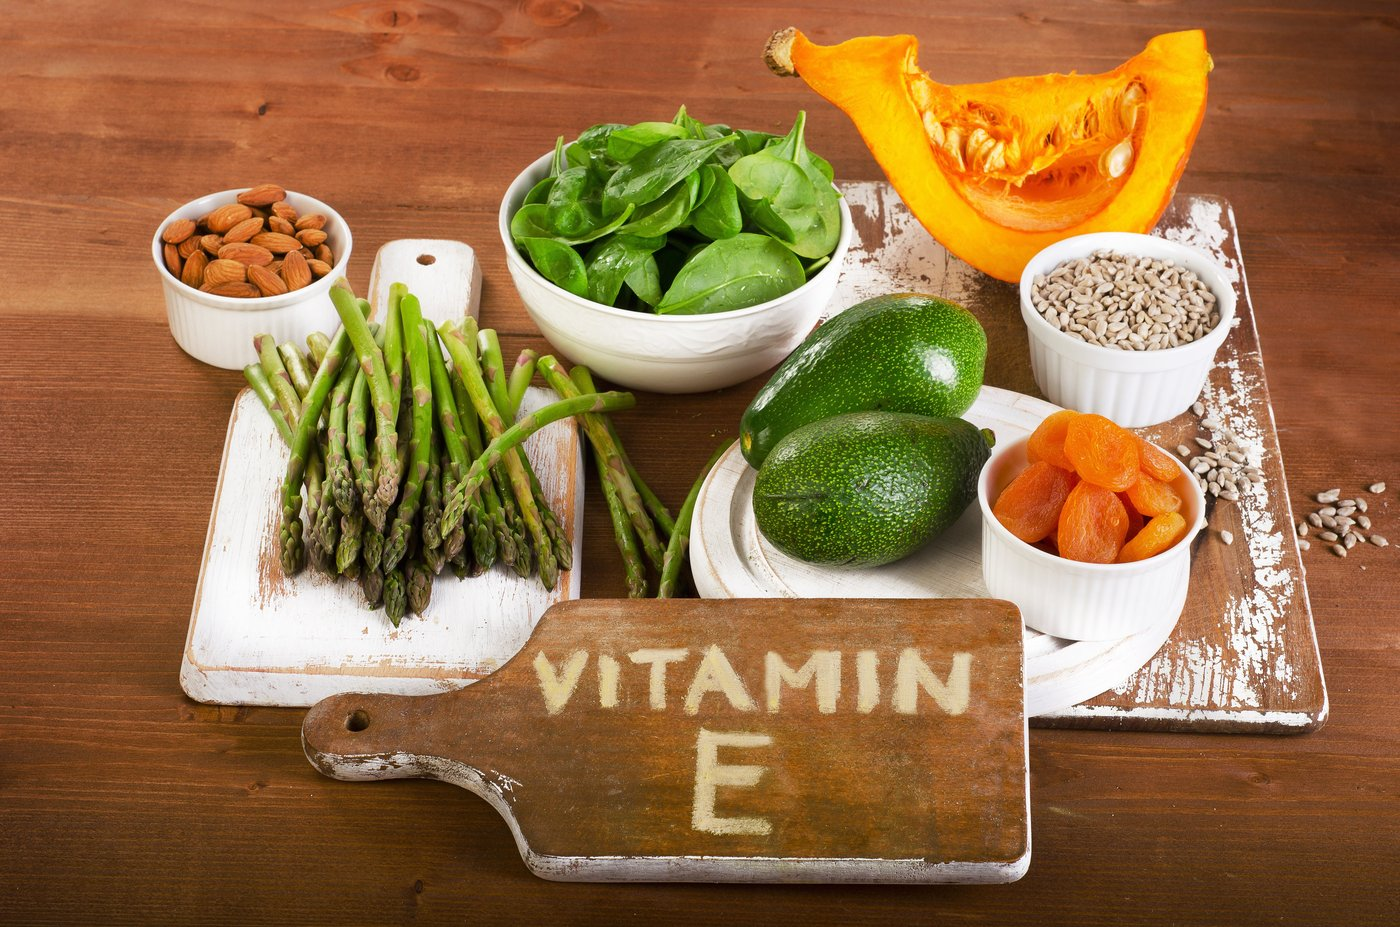 làm căng da mặt bằng vitamin e